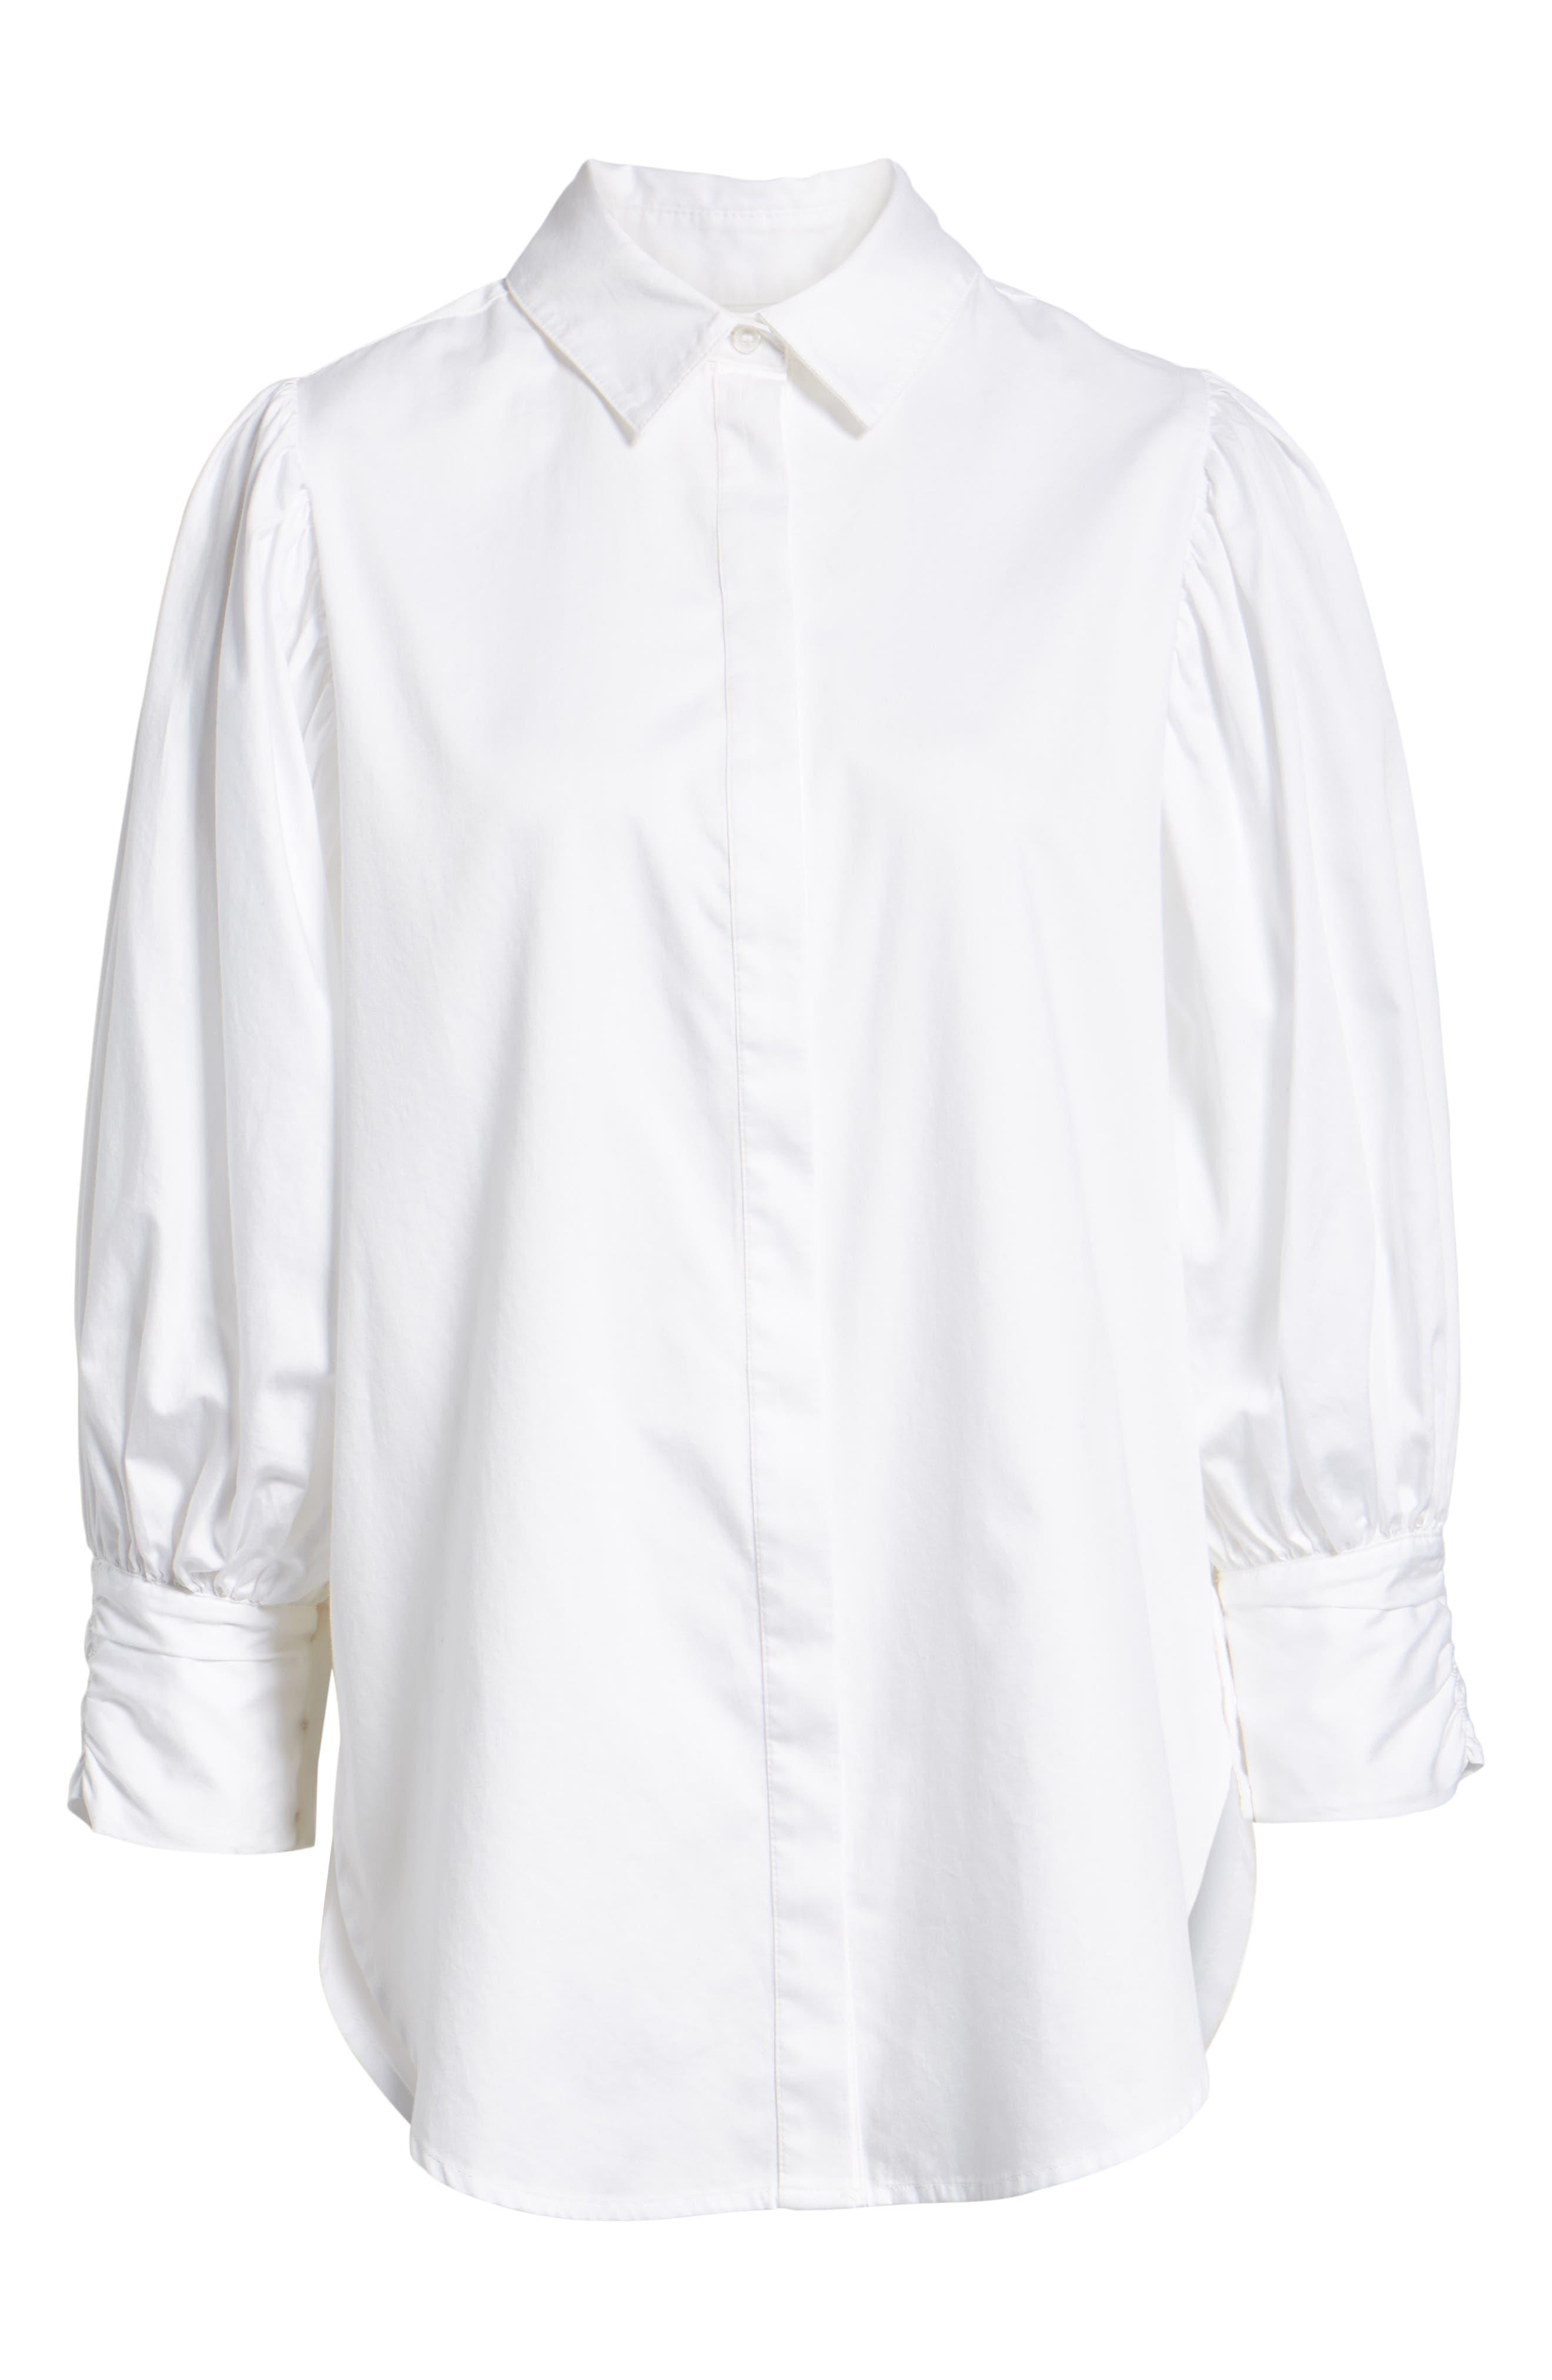 SOMETHING NAVY,                             Full Sleeve Button Through Shirt,                             Alternate thumbnail 6, color,                             100